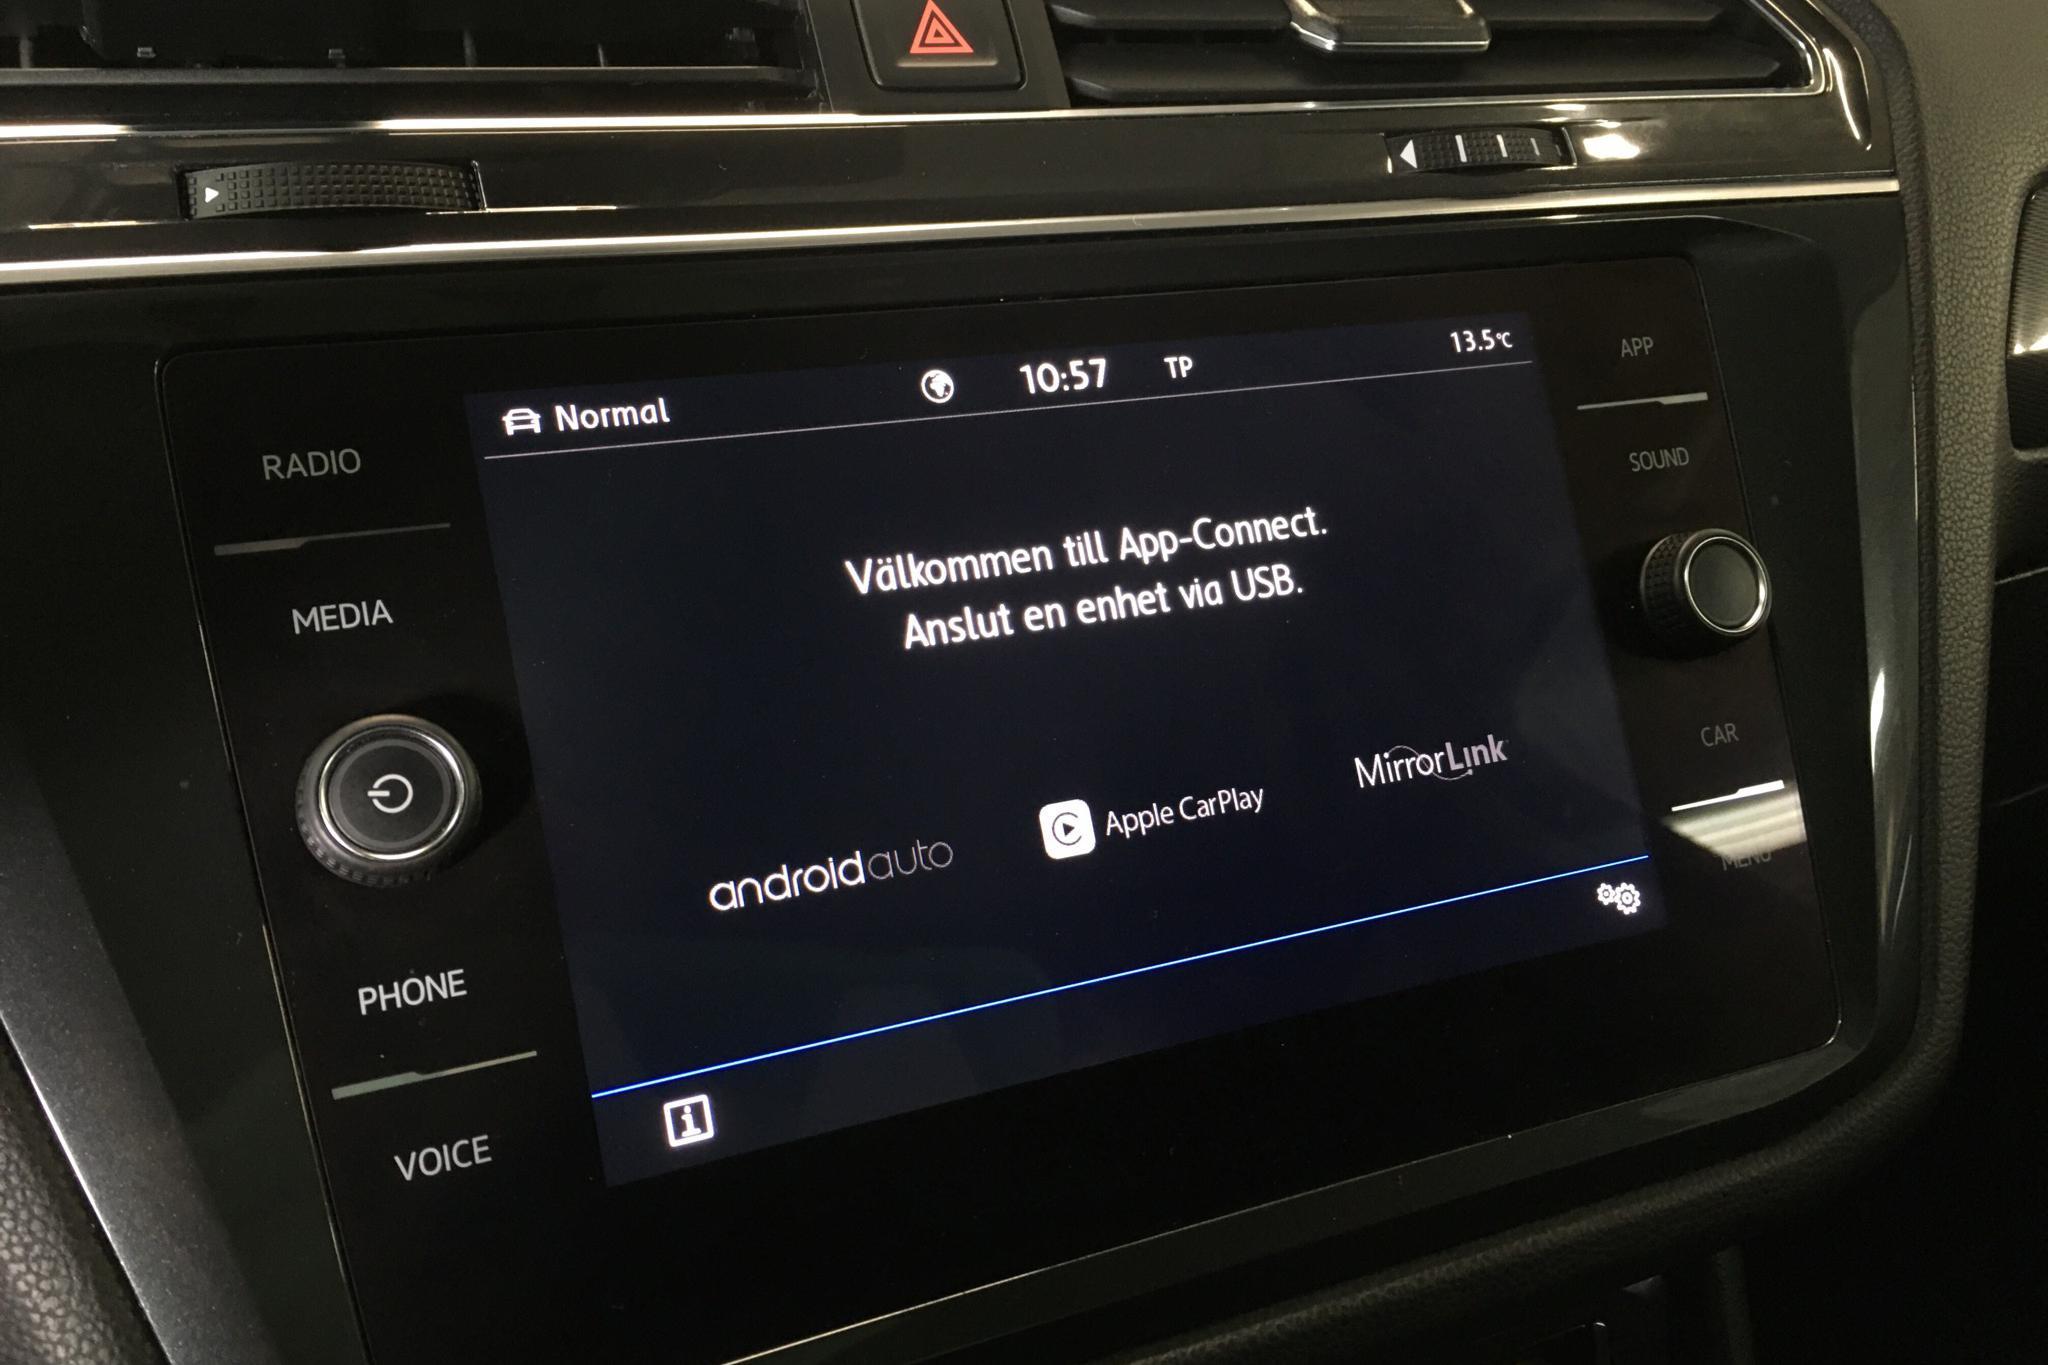 VW Tiguan Allspace 2.0 TDI 4MOTION (190hk) - 10 267 mil - Automat - svart - 2019